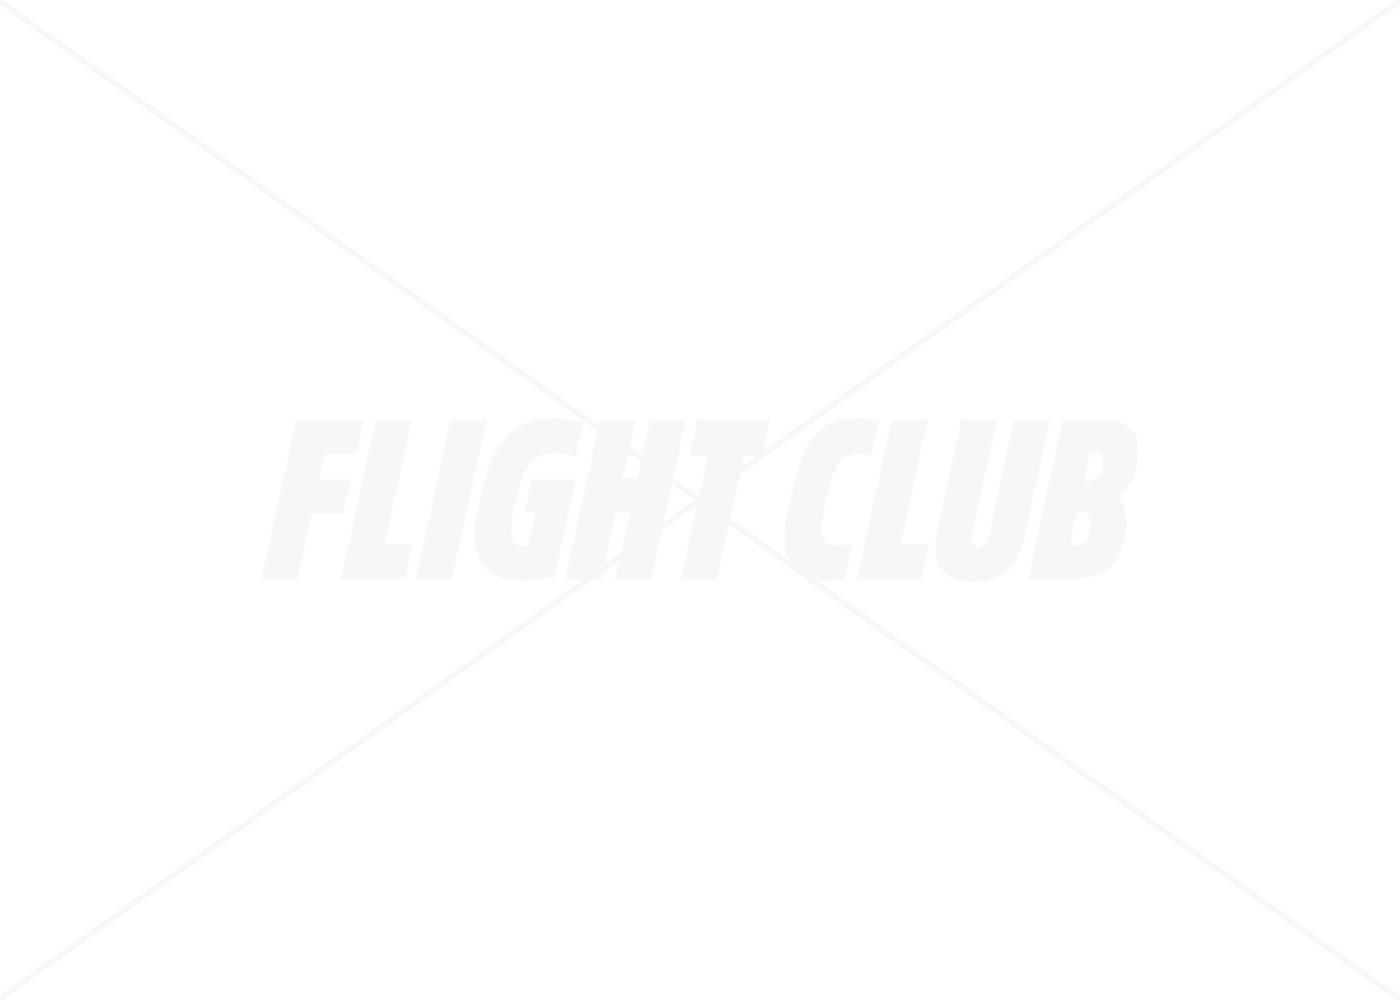 "Dunk Retro Qs""be True""syracuse"""" Nike 850477 101 white orange blaze Flight Club"